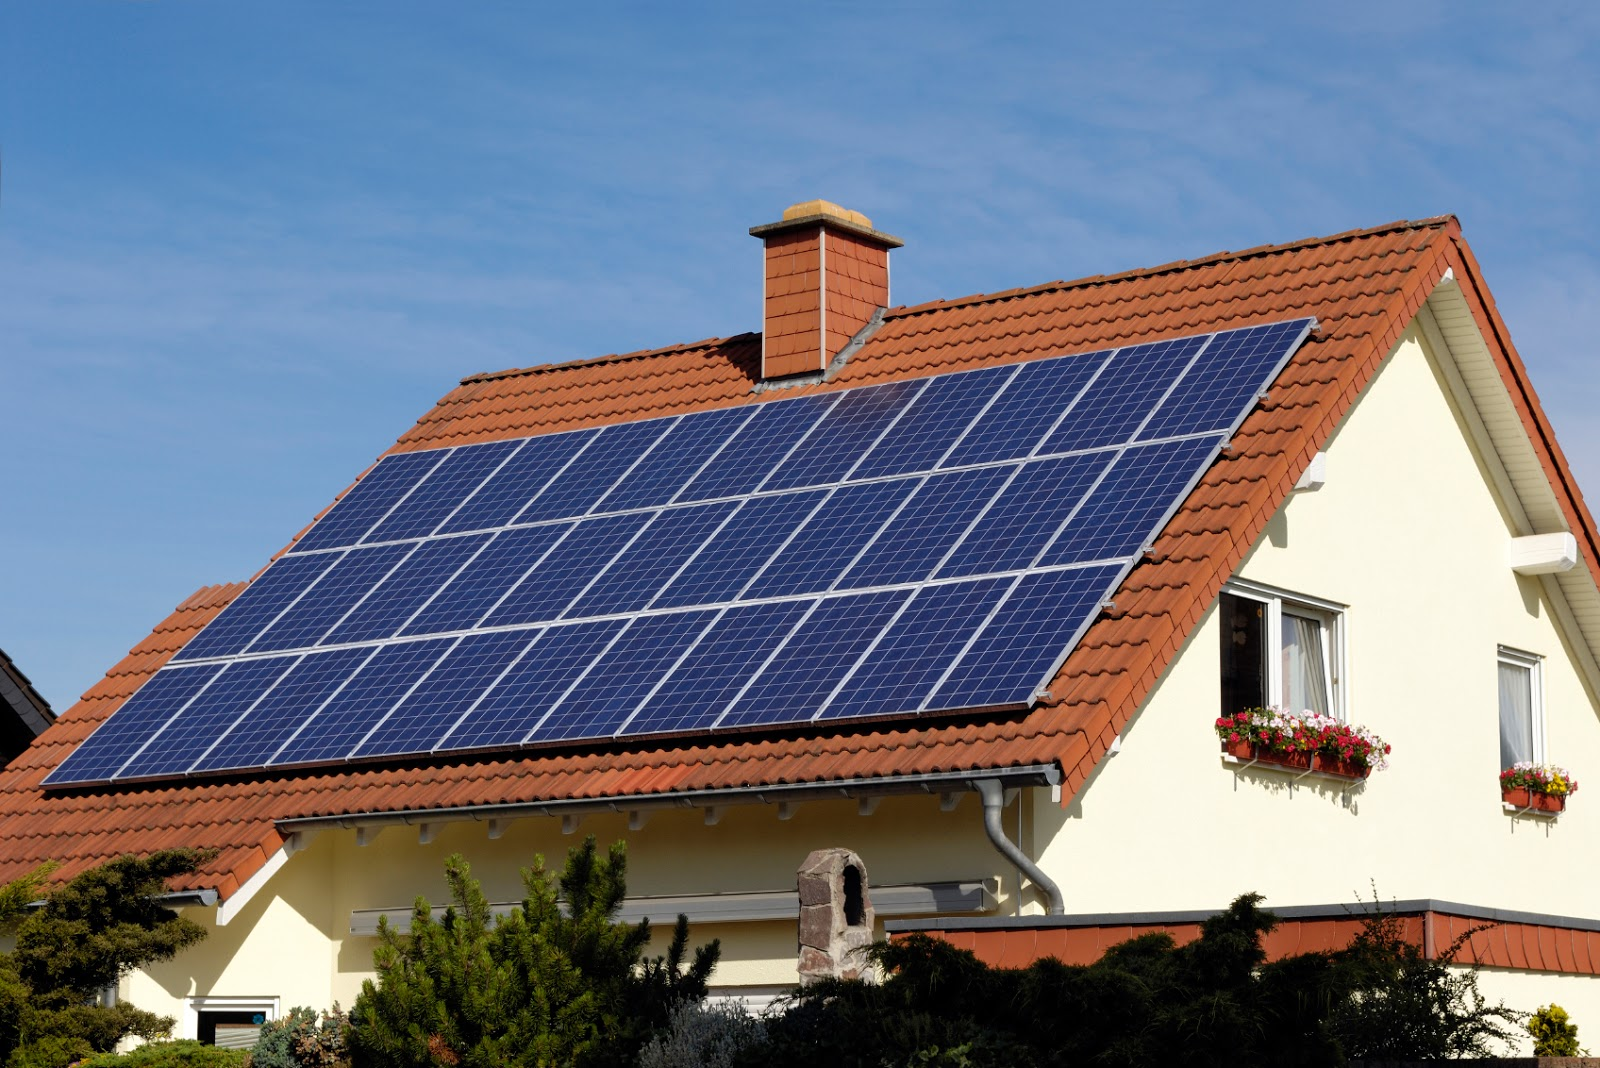 Pasang Panel Solar Atas Bumbung Di Malaysia Install Solar Panels On Roof In Malaysia Bangunan Dan Tempat Yang Sesuai Dipasang Panel Solar Buildings And Places Suitable For Solar Panels Installation